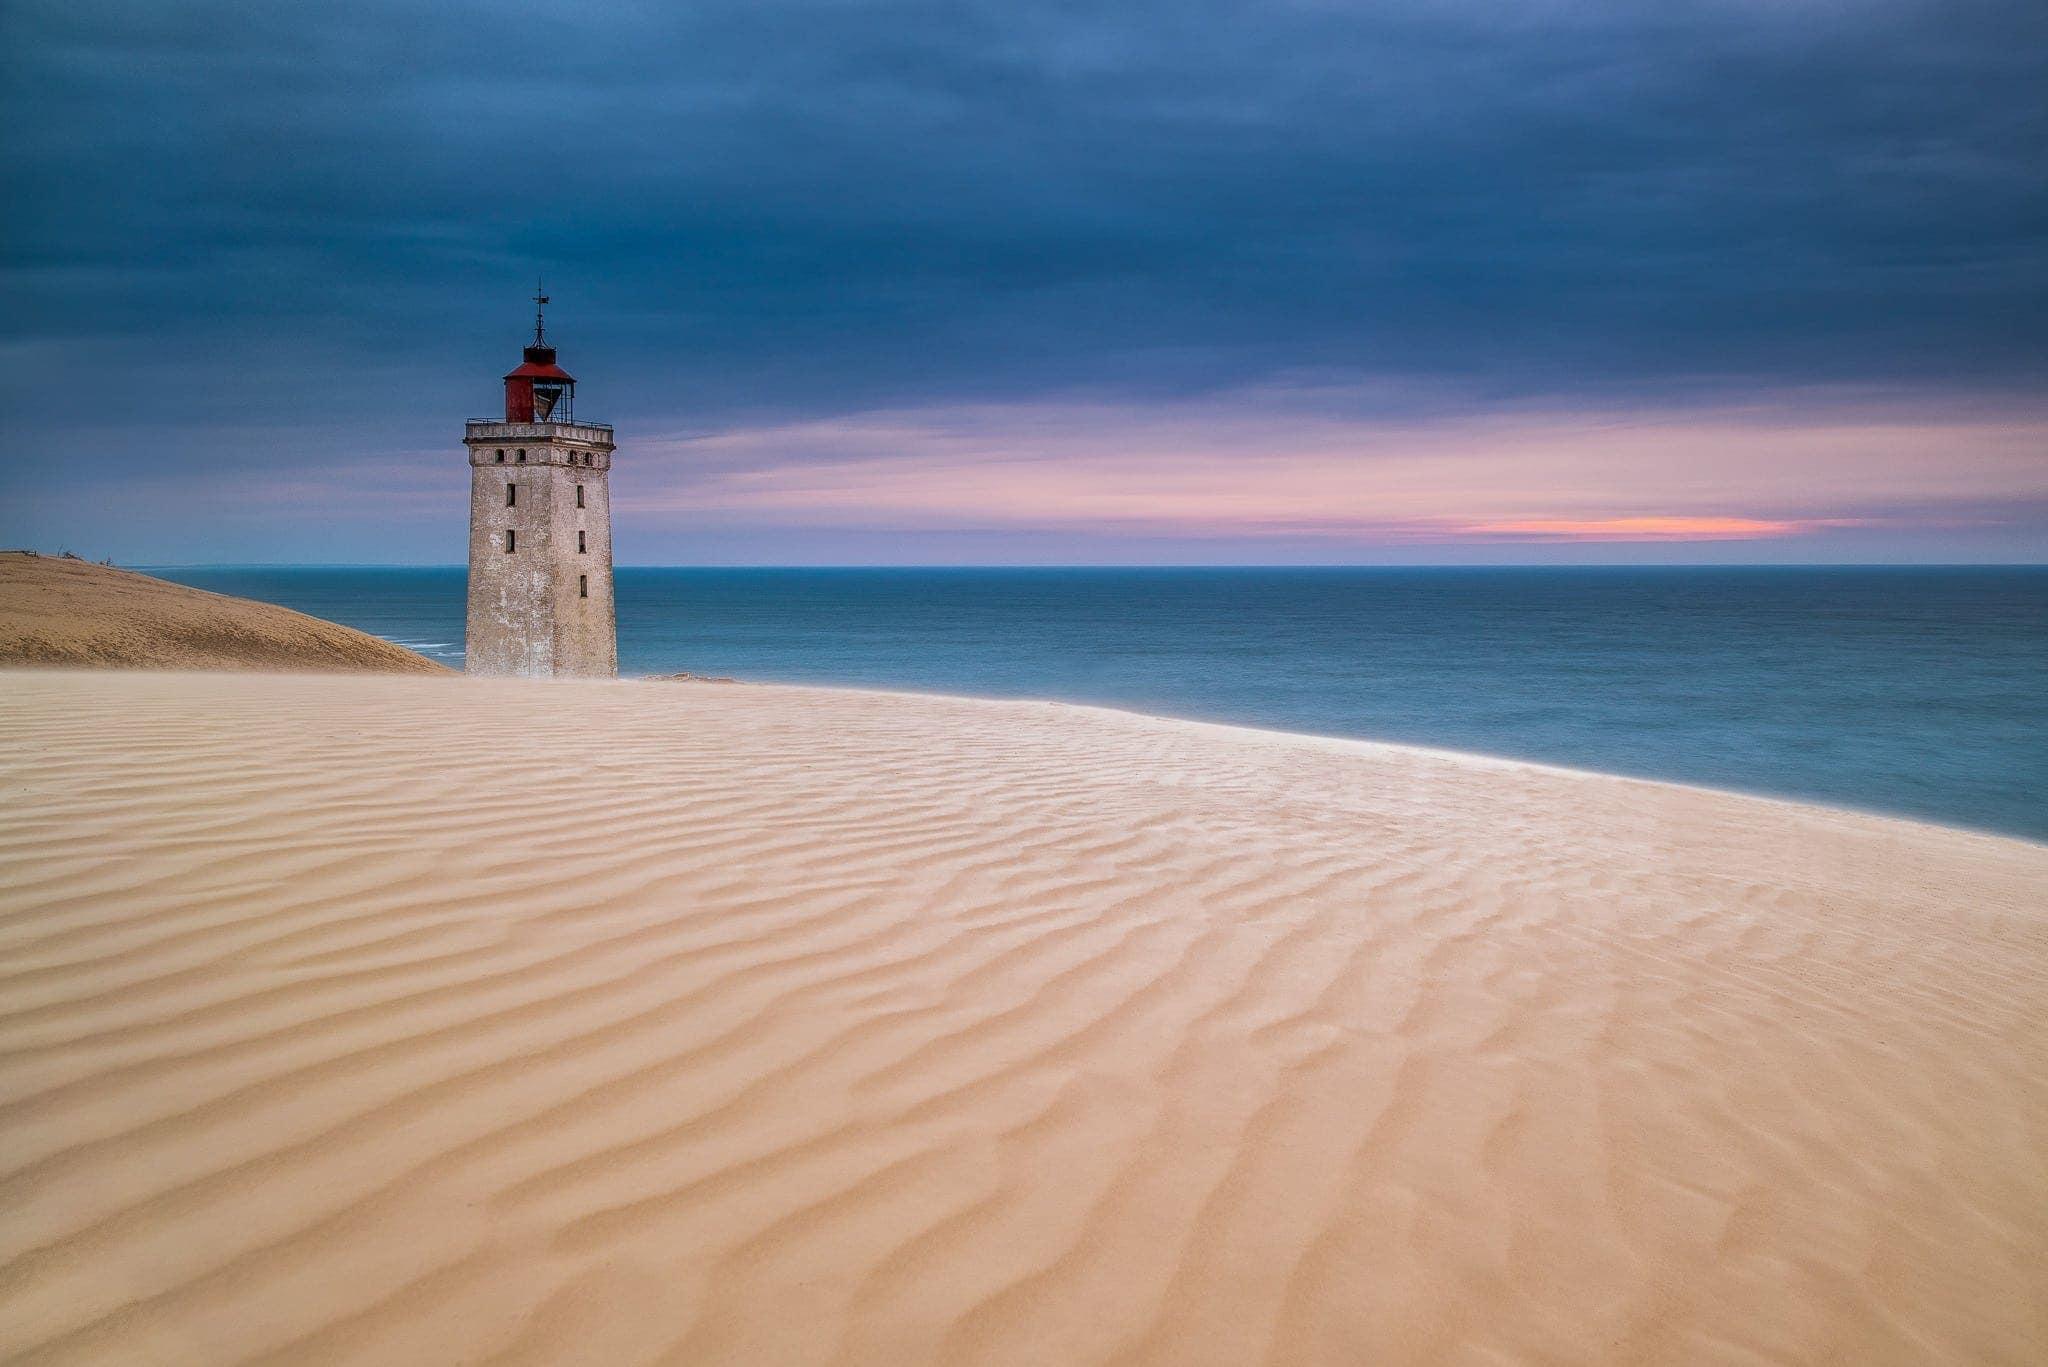 Francesco Gola Seascape Landscape Photography Denmark Lighthouse Rubjerg Knude Long Exposure